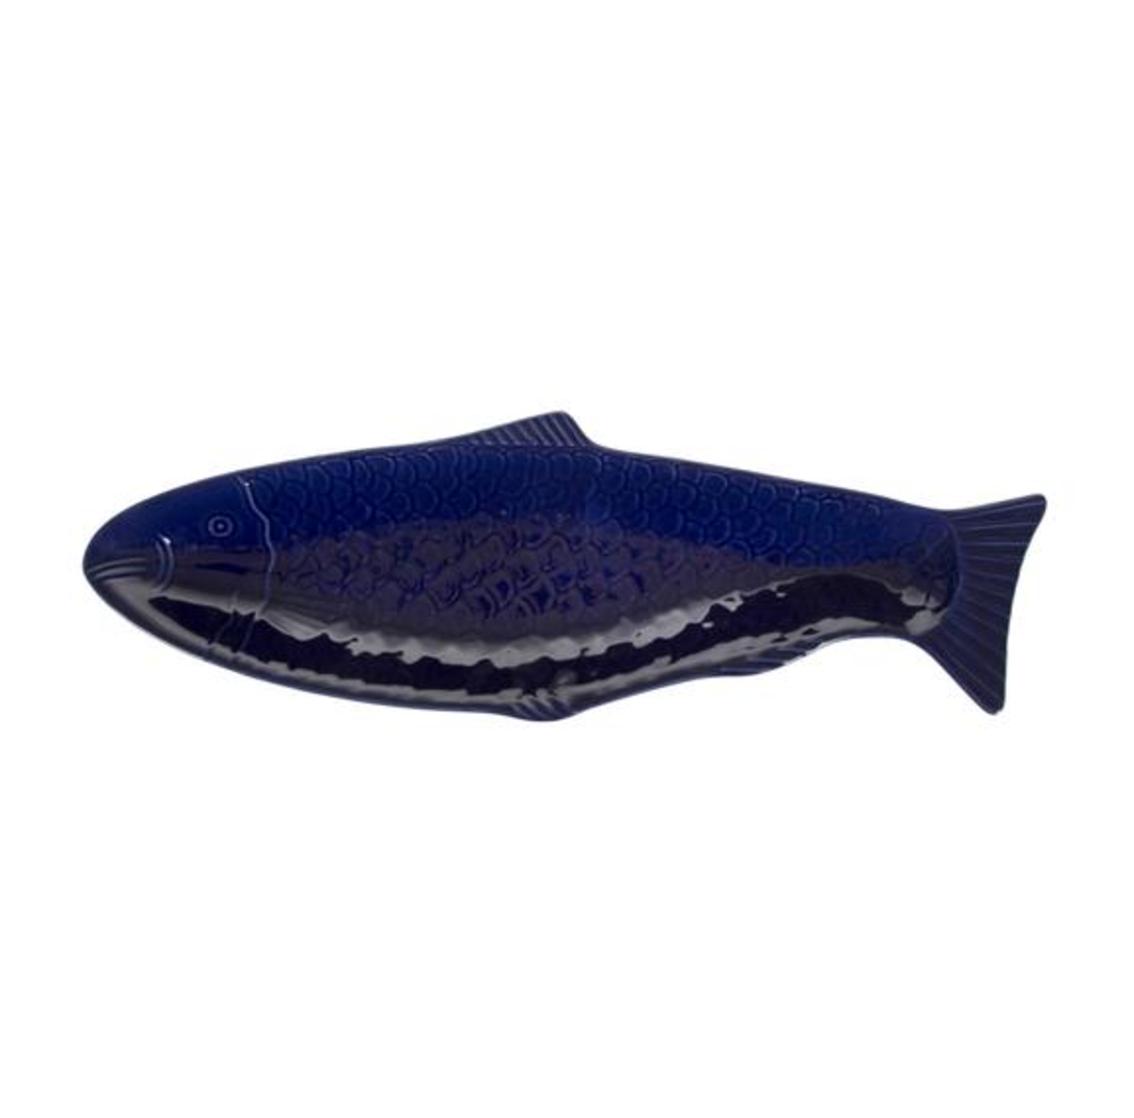 BLUE FISH - Mudo